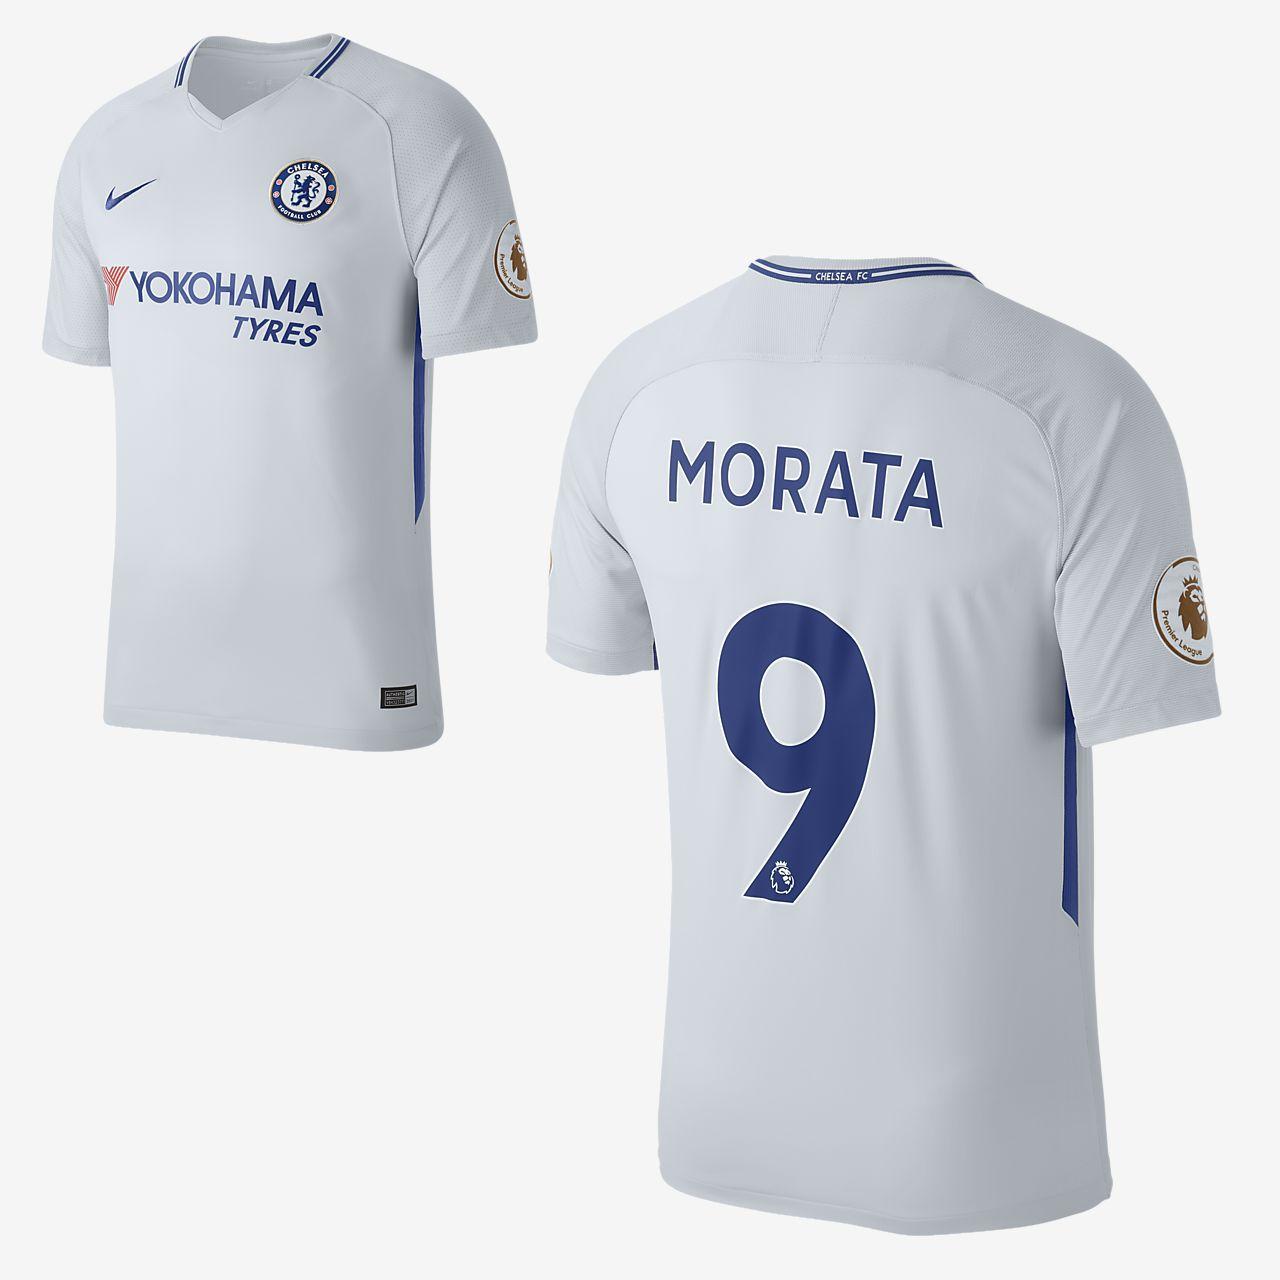 pretty nice 4edc1 7ff1c 2017/18 Chelsea FC Stadium Away (Álvaro Morata) Men's Football Shirt